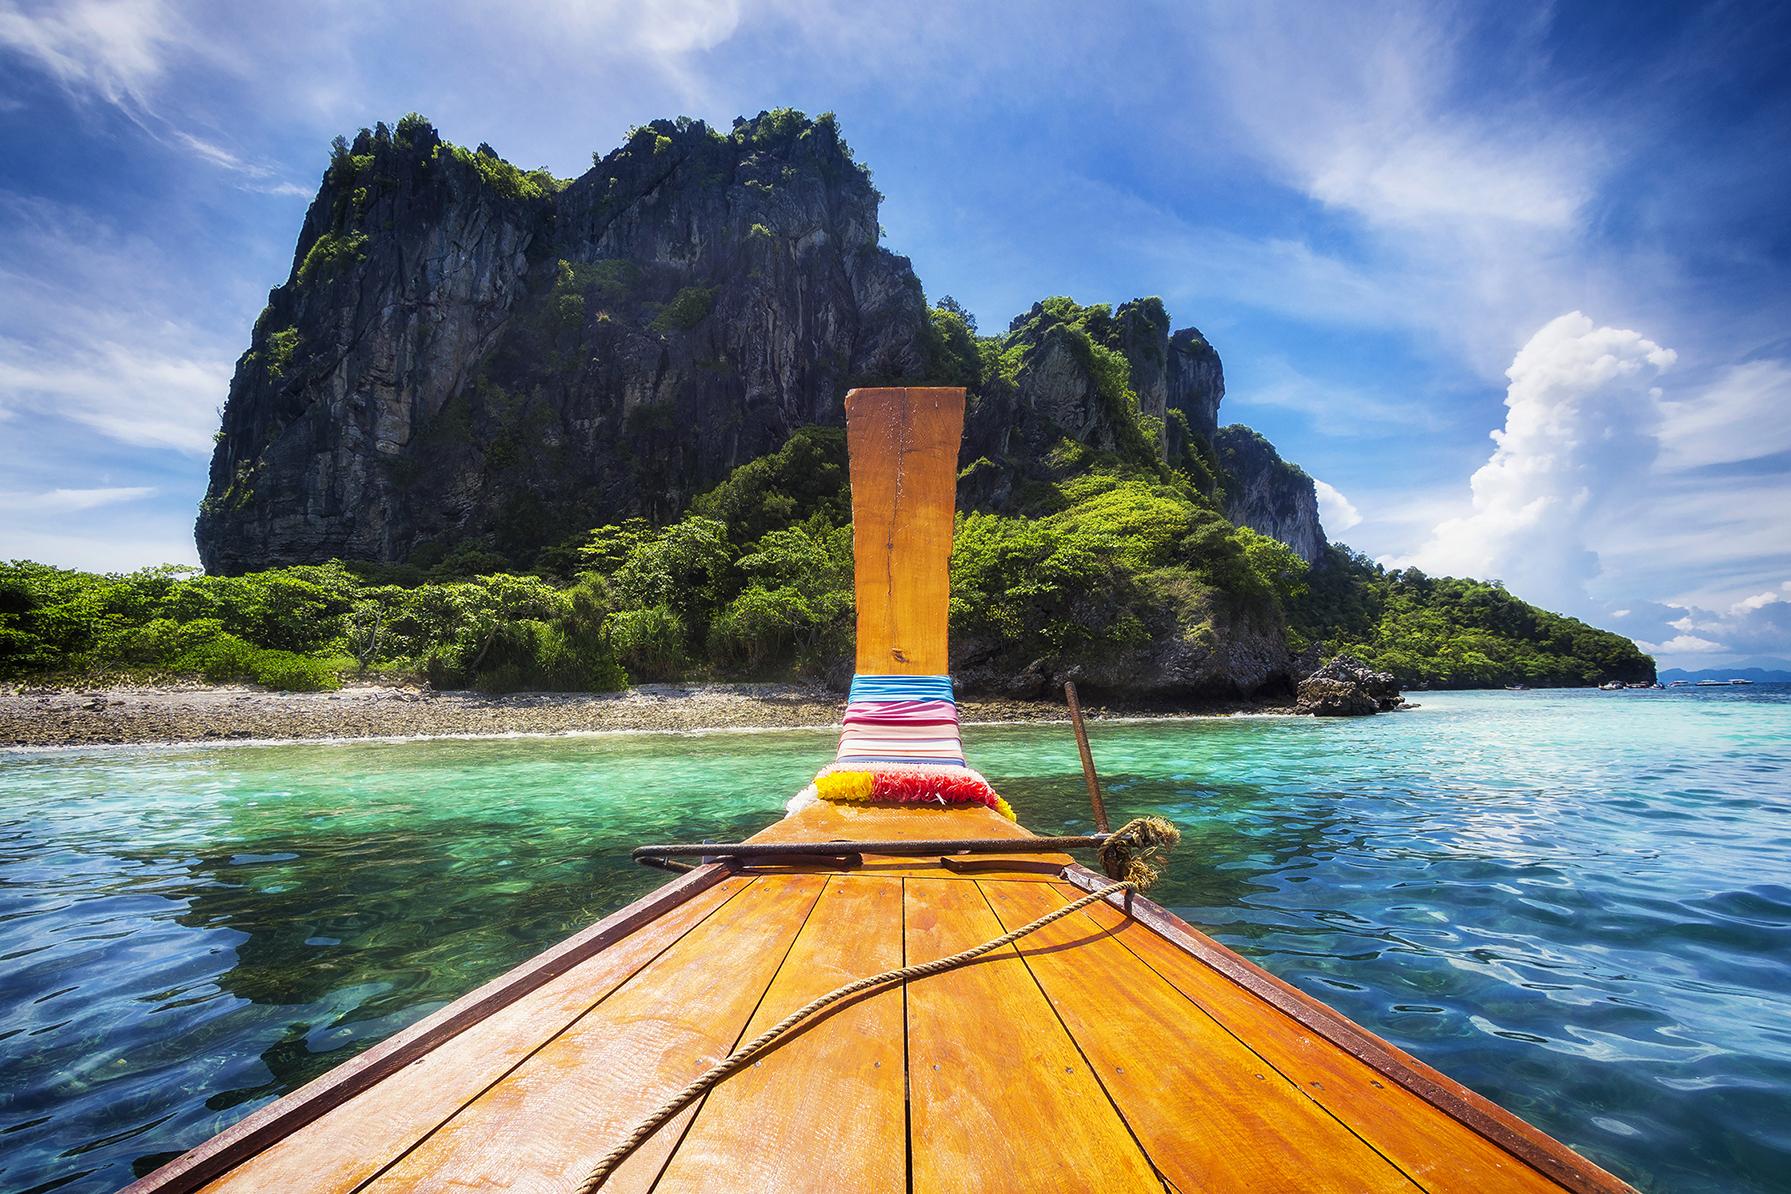 TailBoat_Thailand.jpg